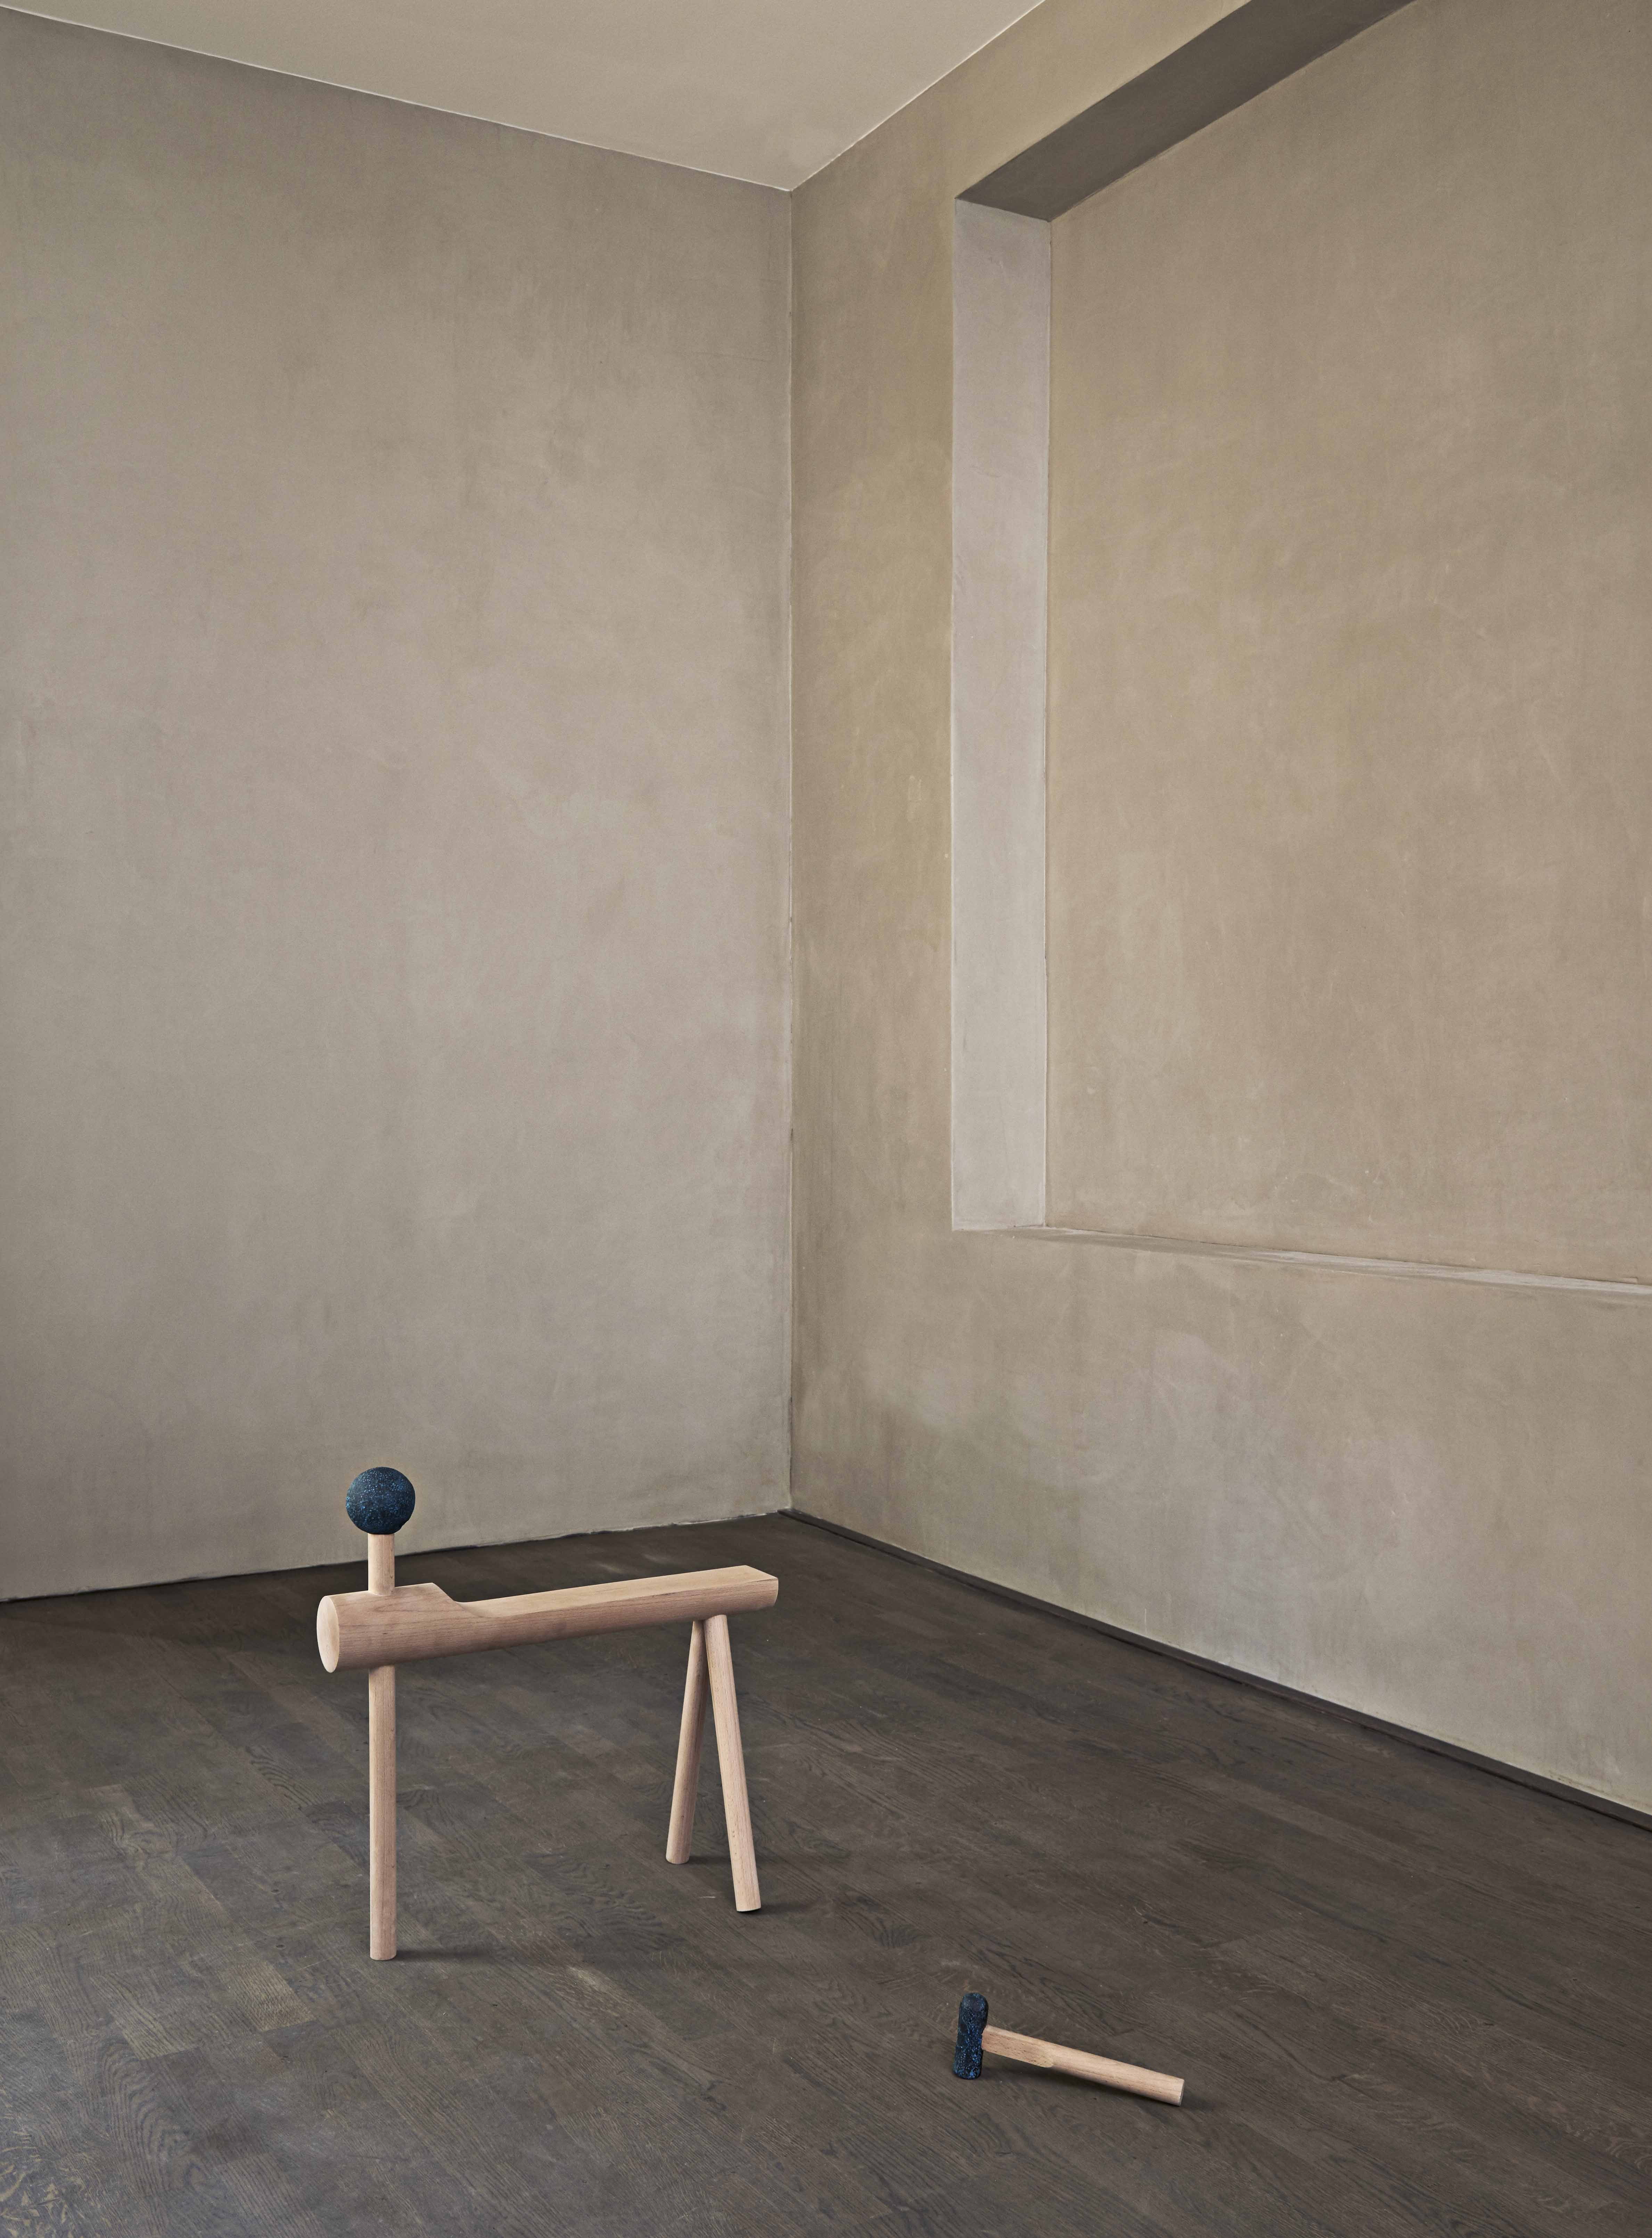 REFORM_Krøyer Sætter-Lassen_ Foto Emil Monty Freddie